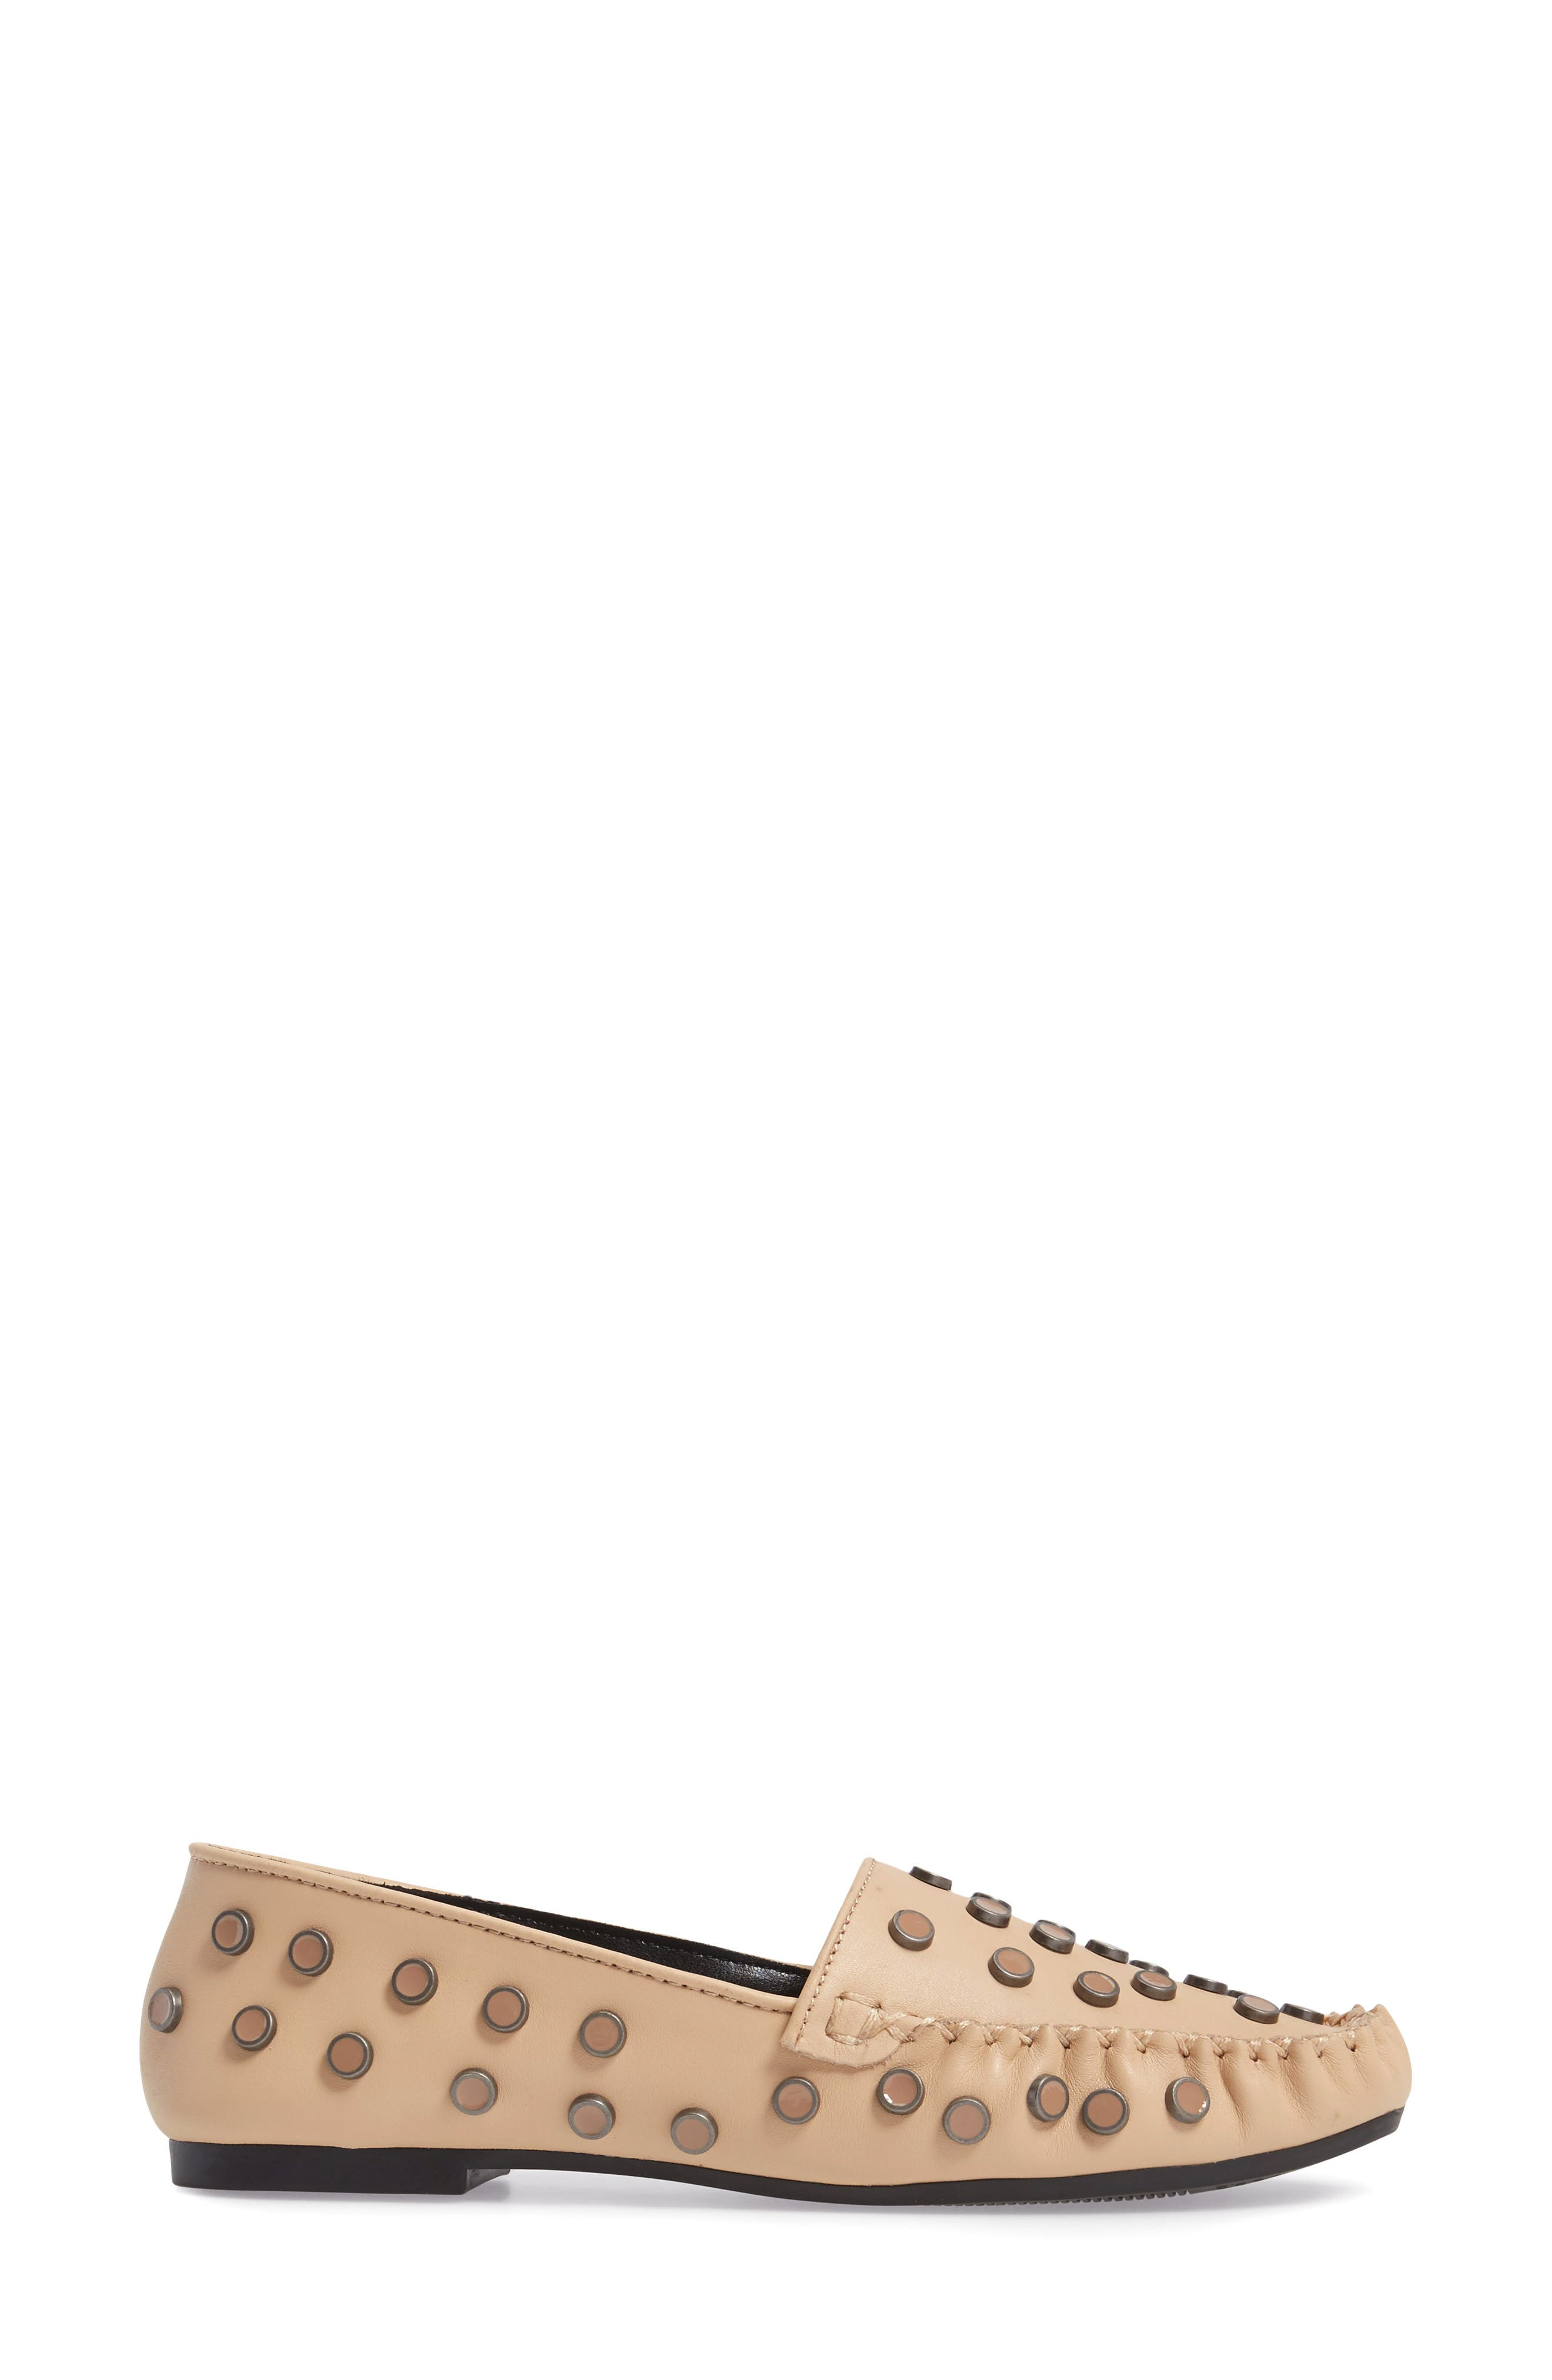 Alternate Image 3  - M4D3 Conneticut Loafer (Women)